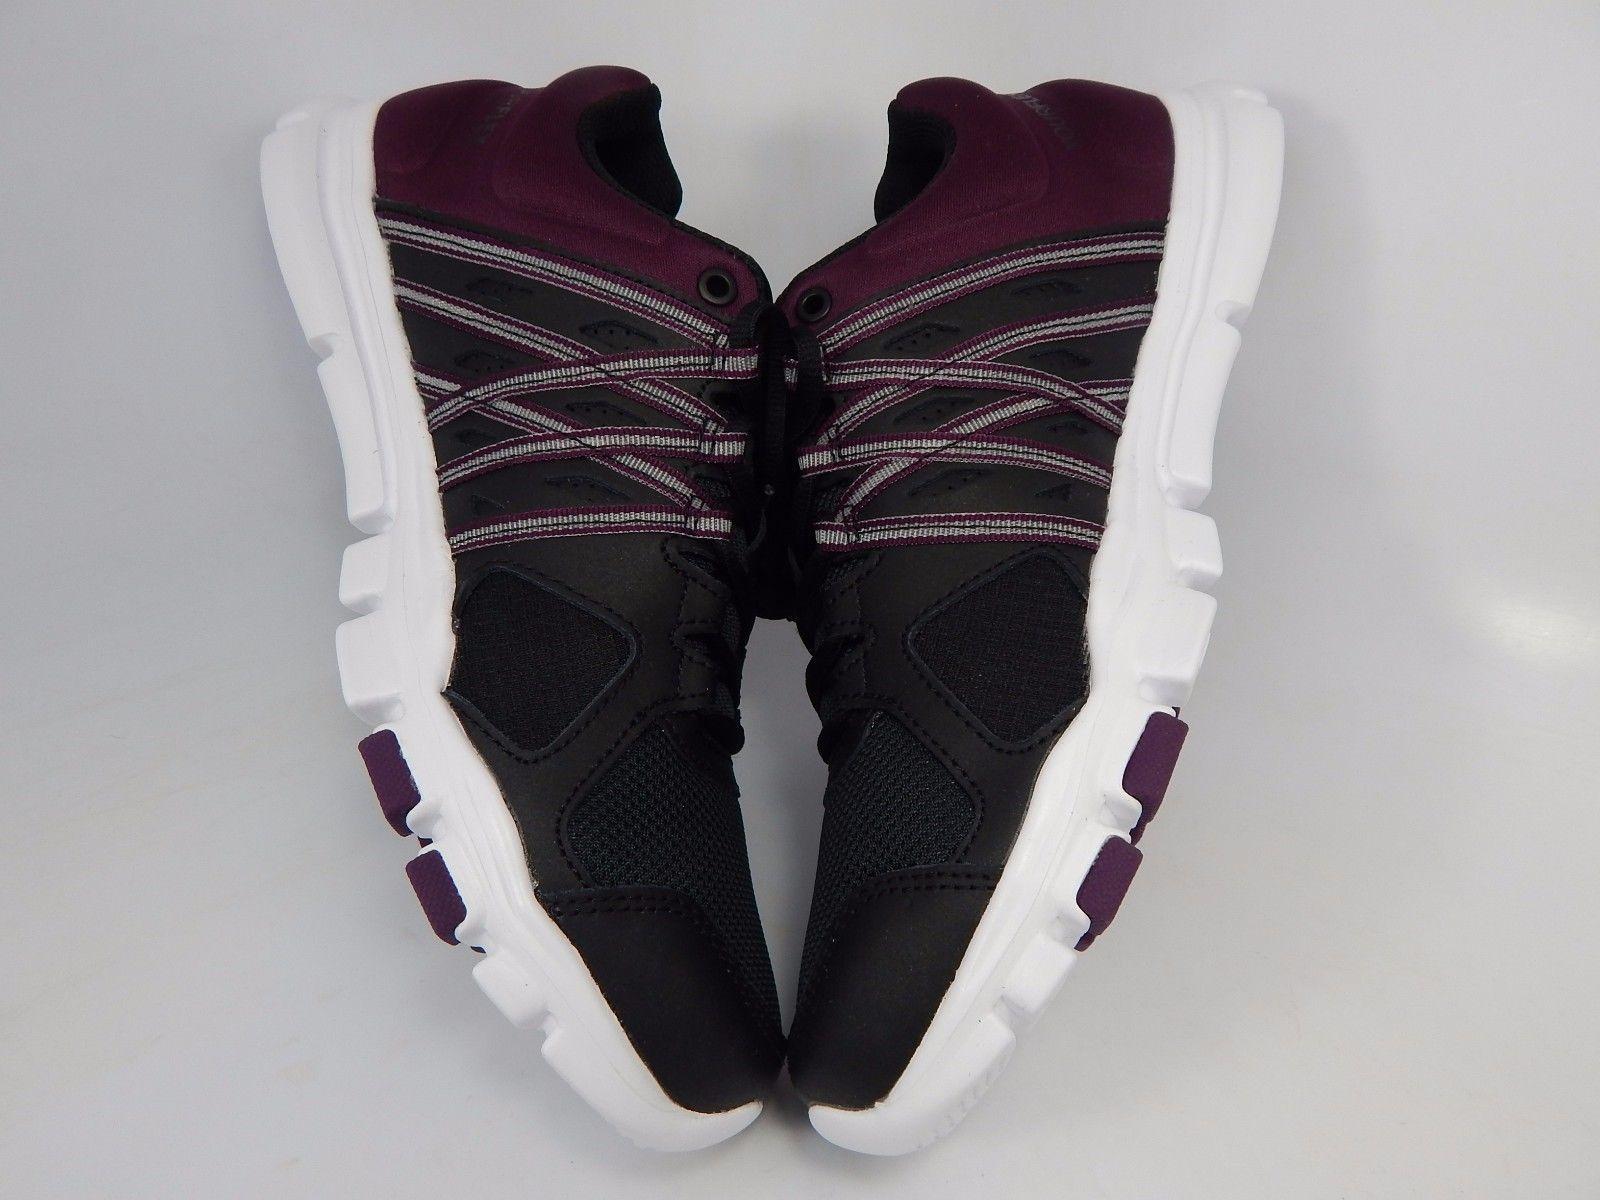 Reebok Yourflex Trainette 8.0 LMT Women's Running Shoes Size US 8 M (B) EU 38.5